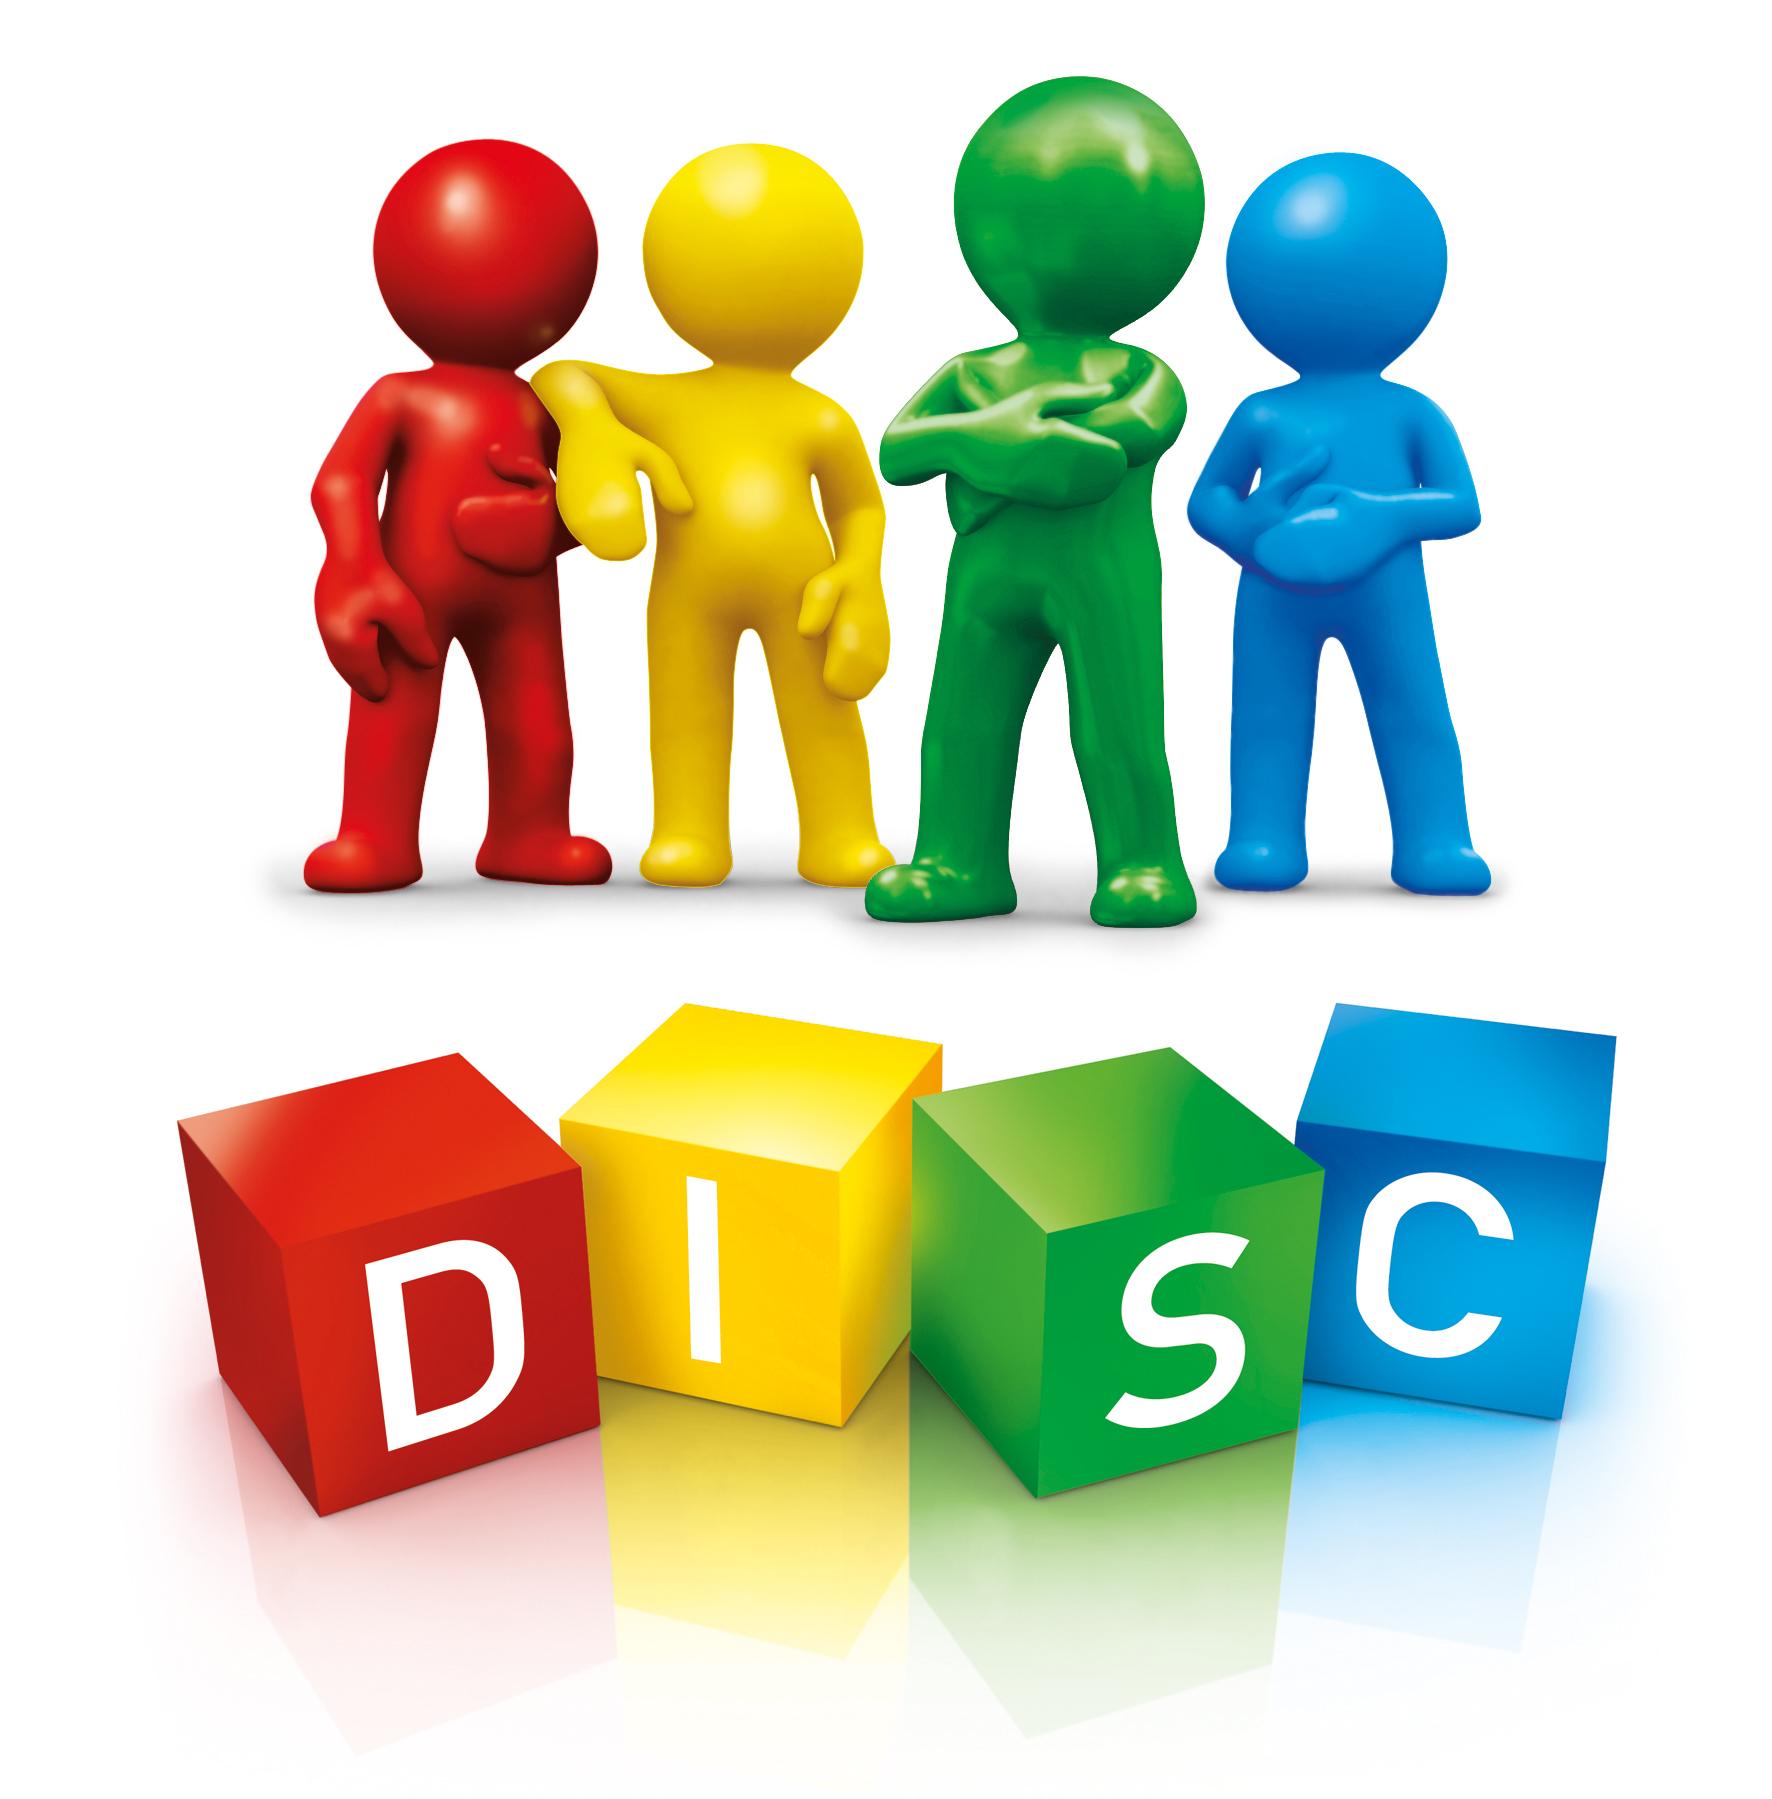 Coaching Focus - DISC Dudes with Cubes